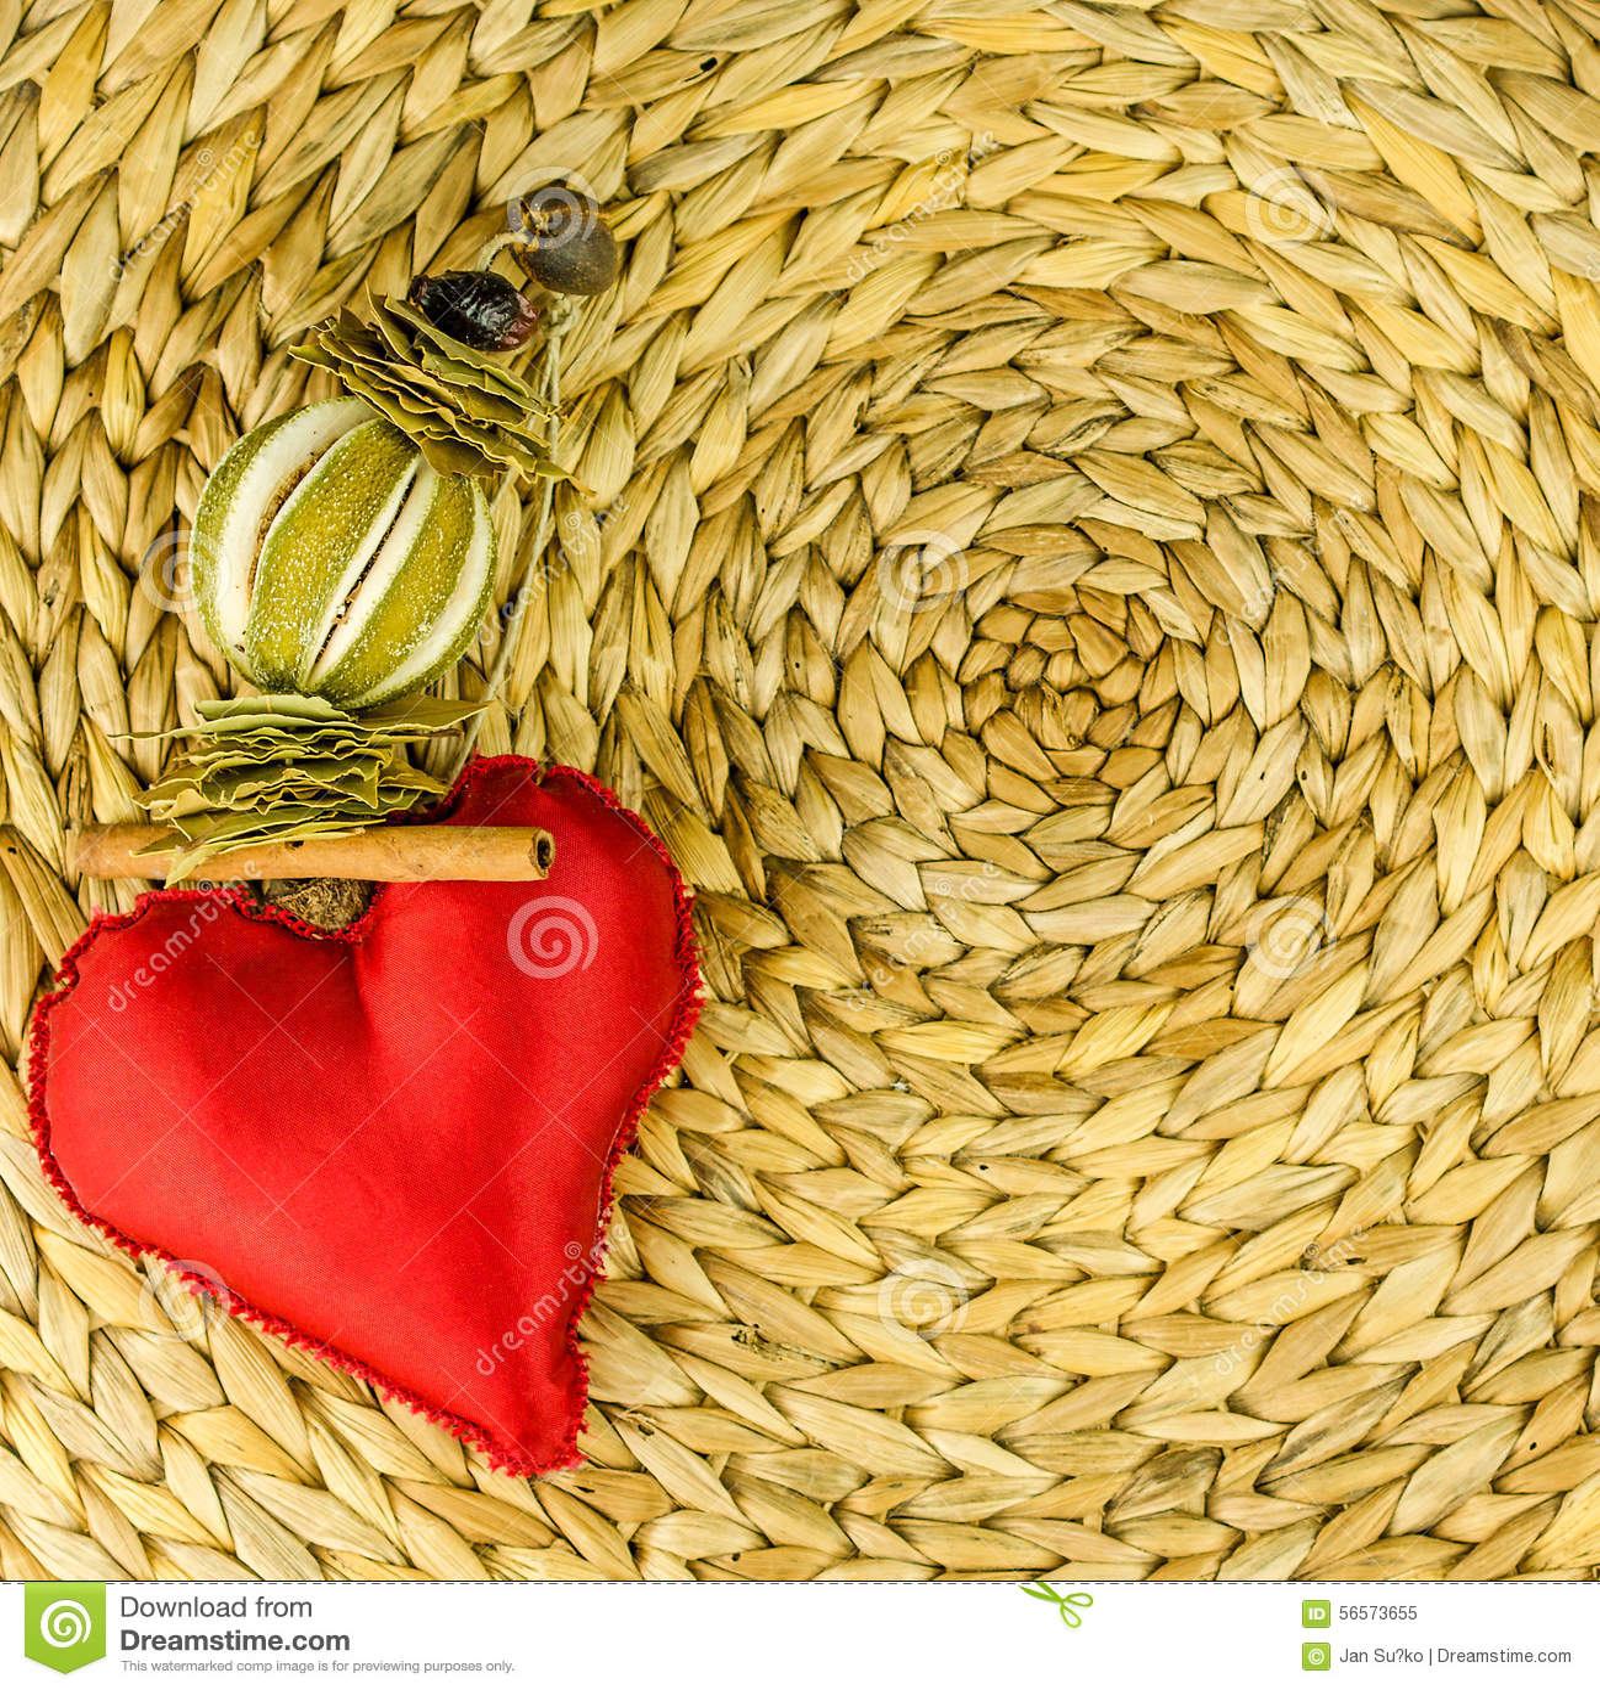 Download Κόκκινη διακόσμηση καρδιών στο υπόβαθρο φιαγμένο από ξηρό φύλλο μπανανών Στοκ Εικόνα - εικόνα από οργανικός, κανέλα: 56573655